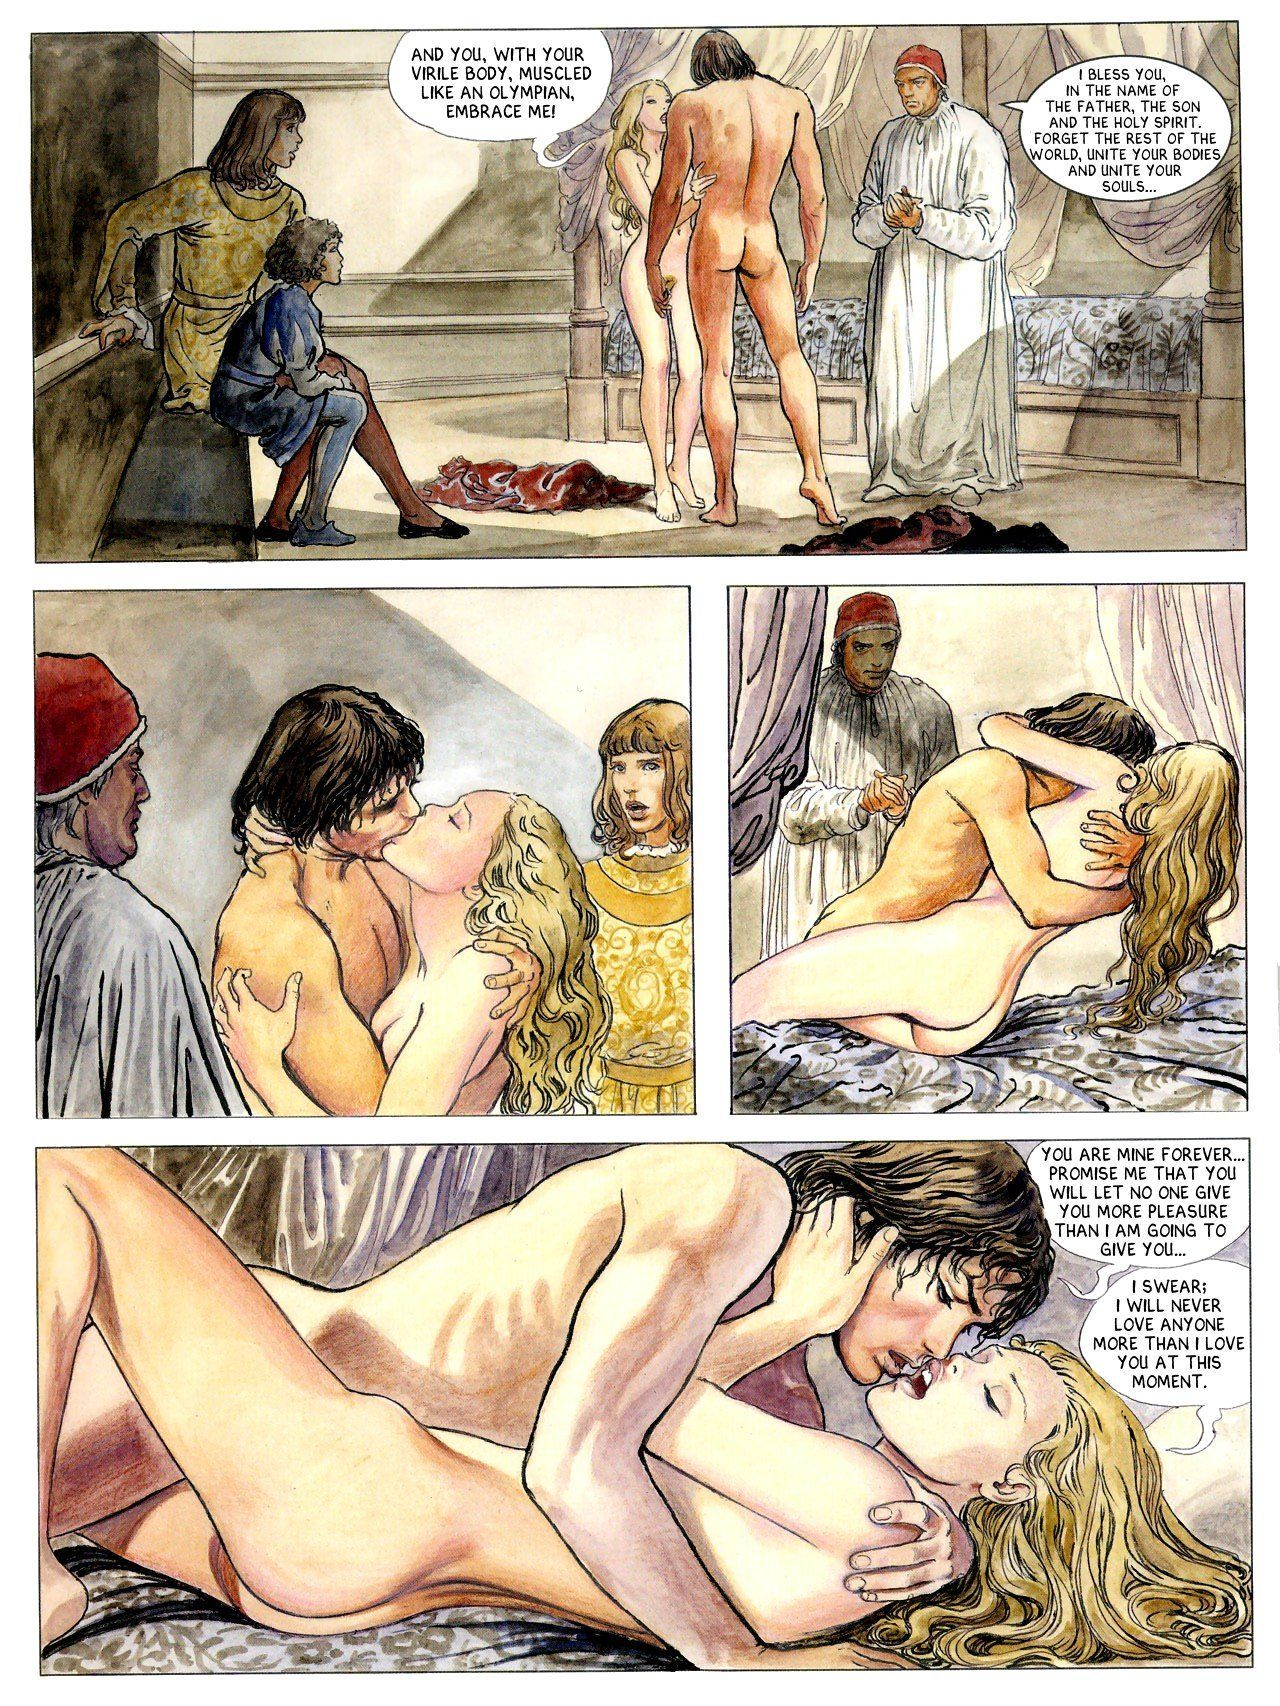 эро истории воспитание шлюхи глава 1